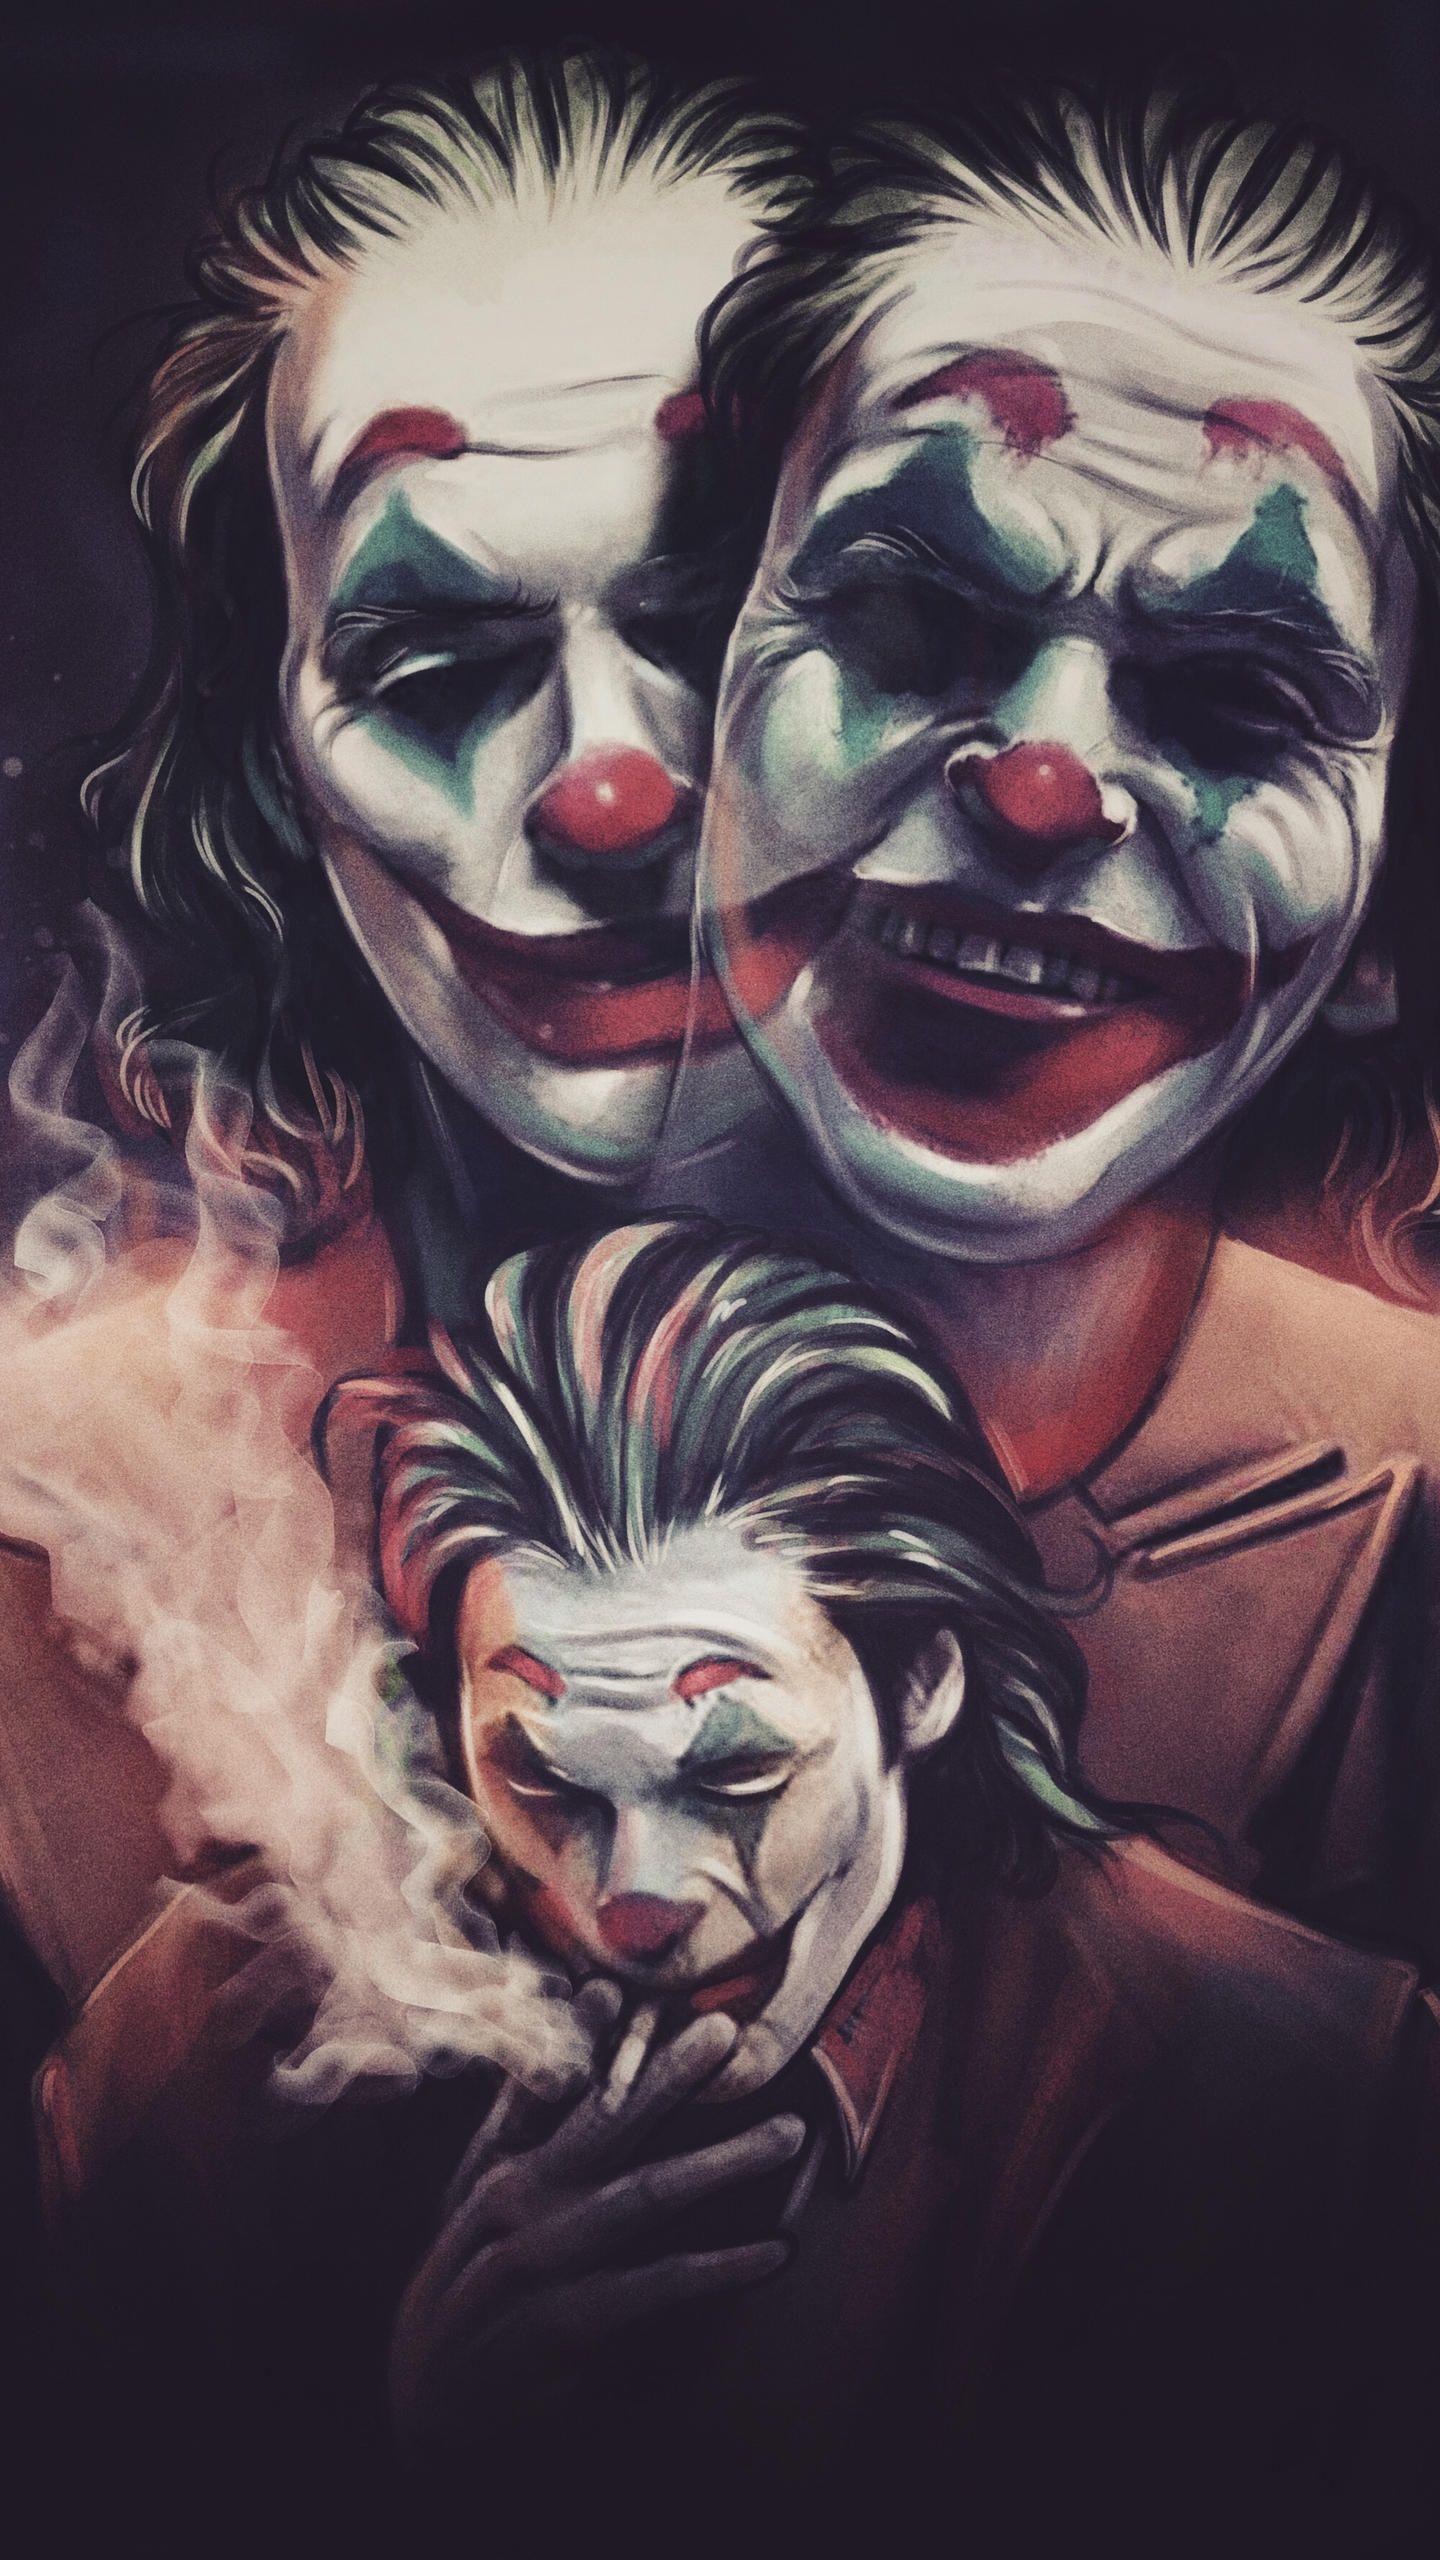 Joker Hd Images 4k Download Batman Joker Wallpaper Joker Wallpapers Joker Images